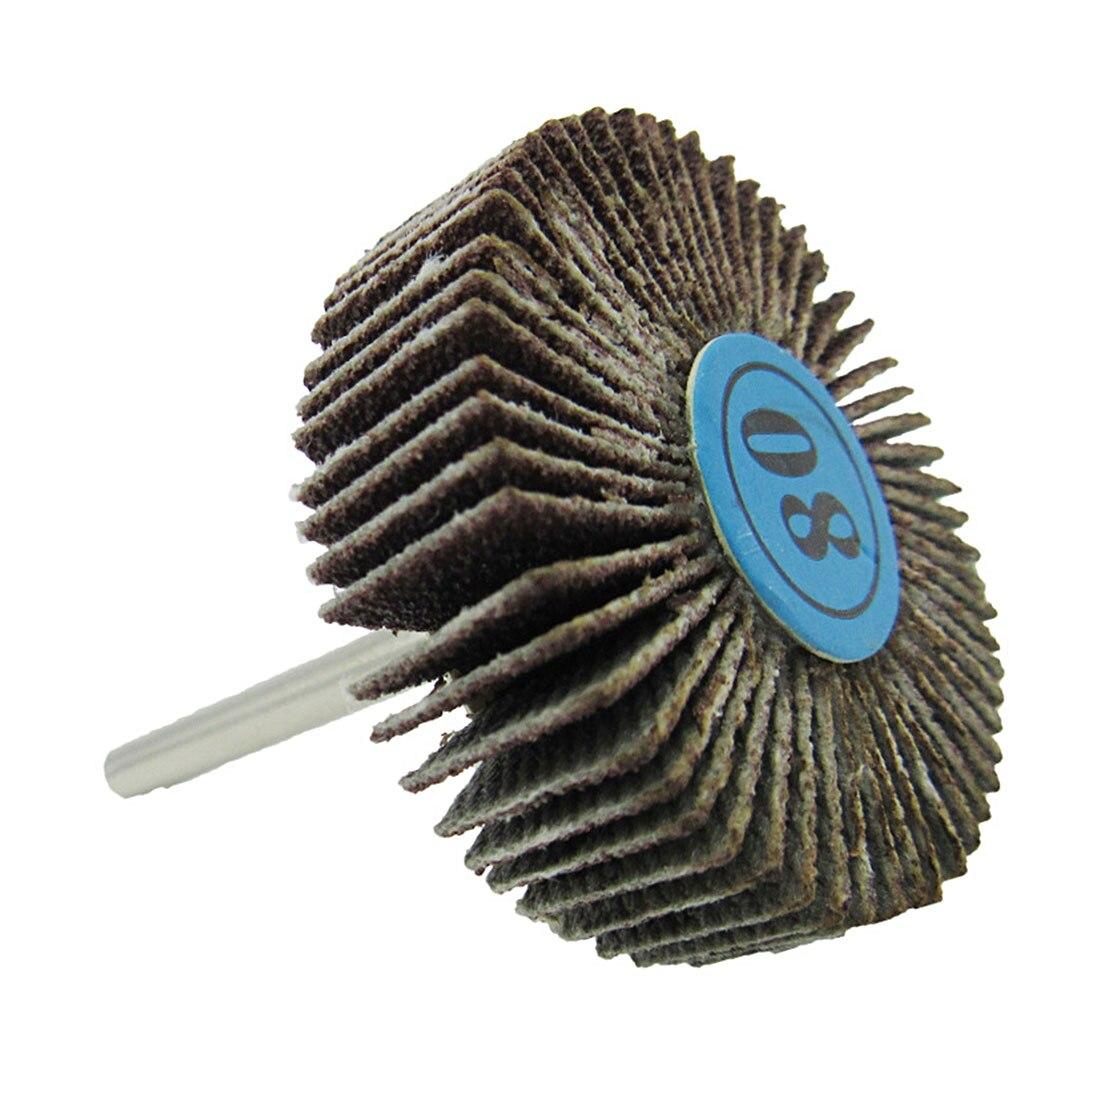 5Pcs Dremel Accessories Sandpaper Sanding Flap Polishing Wheels Sanding Disc Set Shutter Polishing Wheel For Rotary Tools